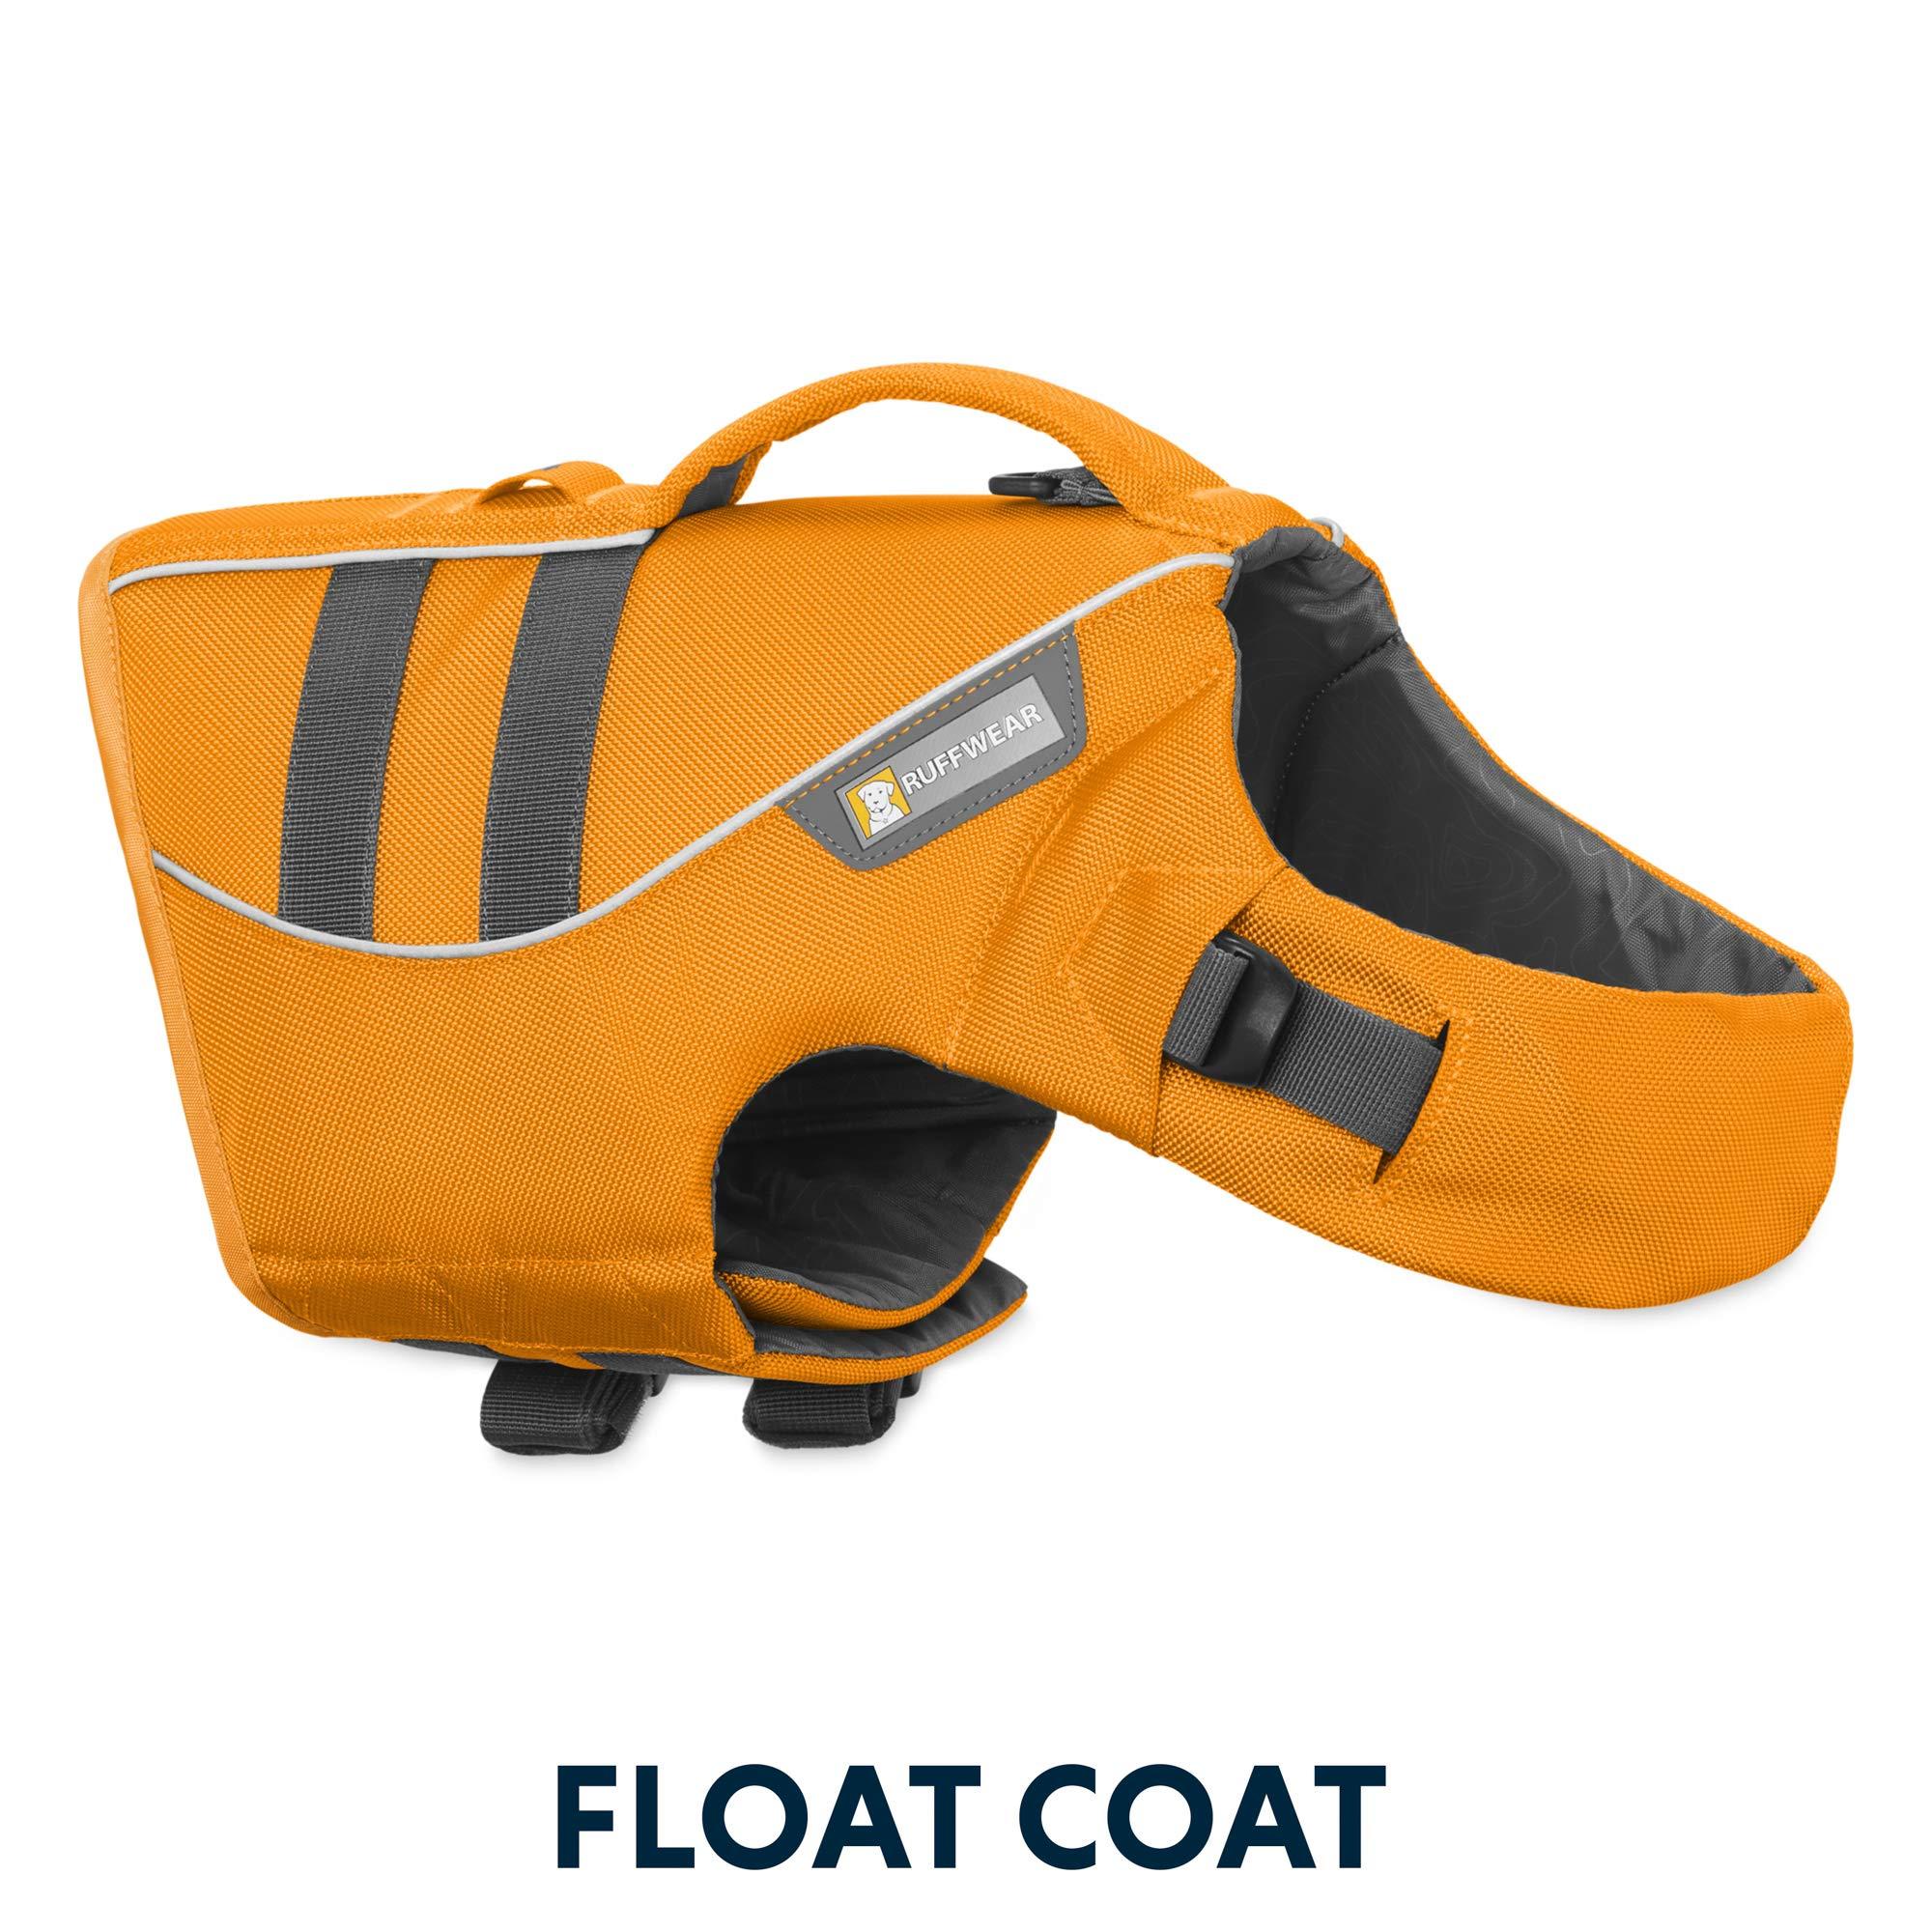 RUFFWEAR - Float Coat Dog Life Jacket for Swimming, Adjustable and Reflective, Wave Orange, Medium by RUFFWEAR